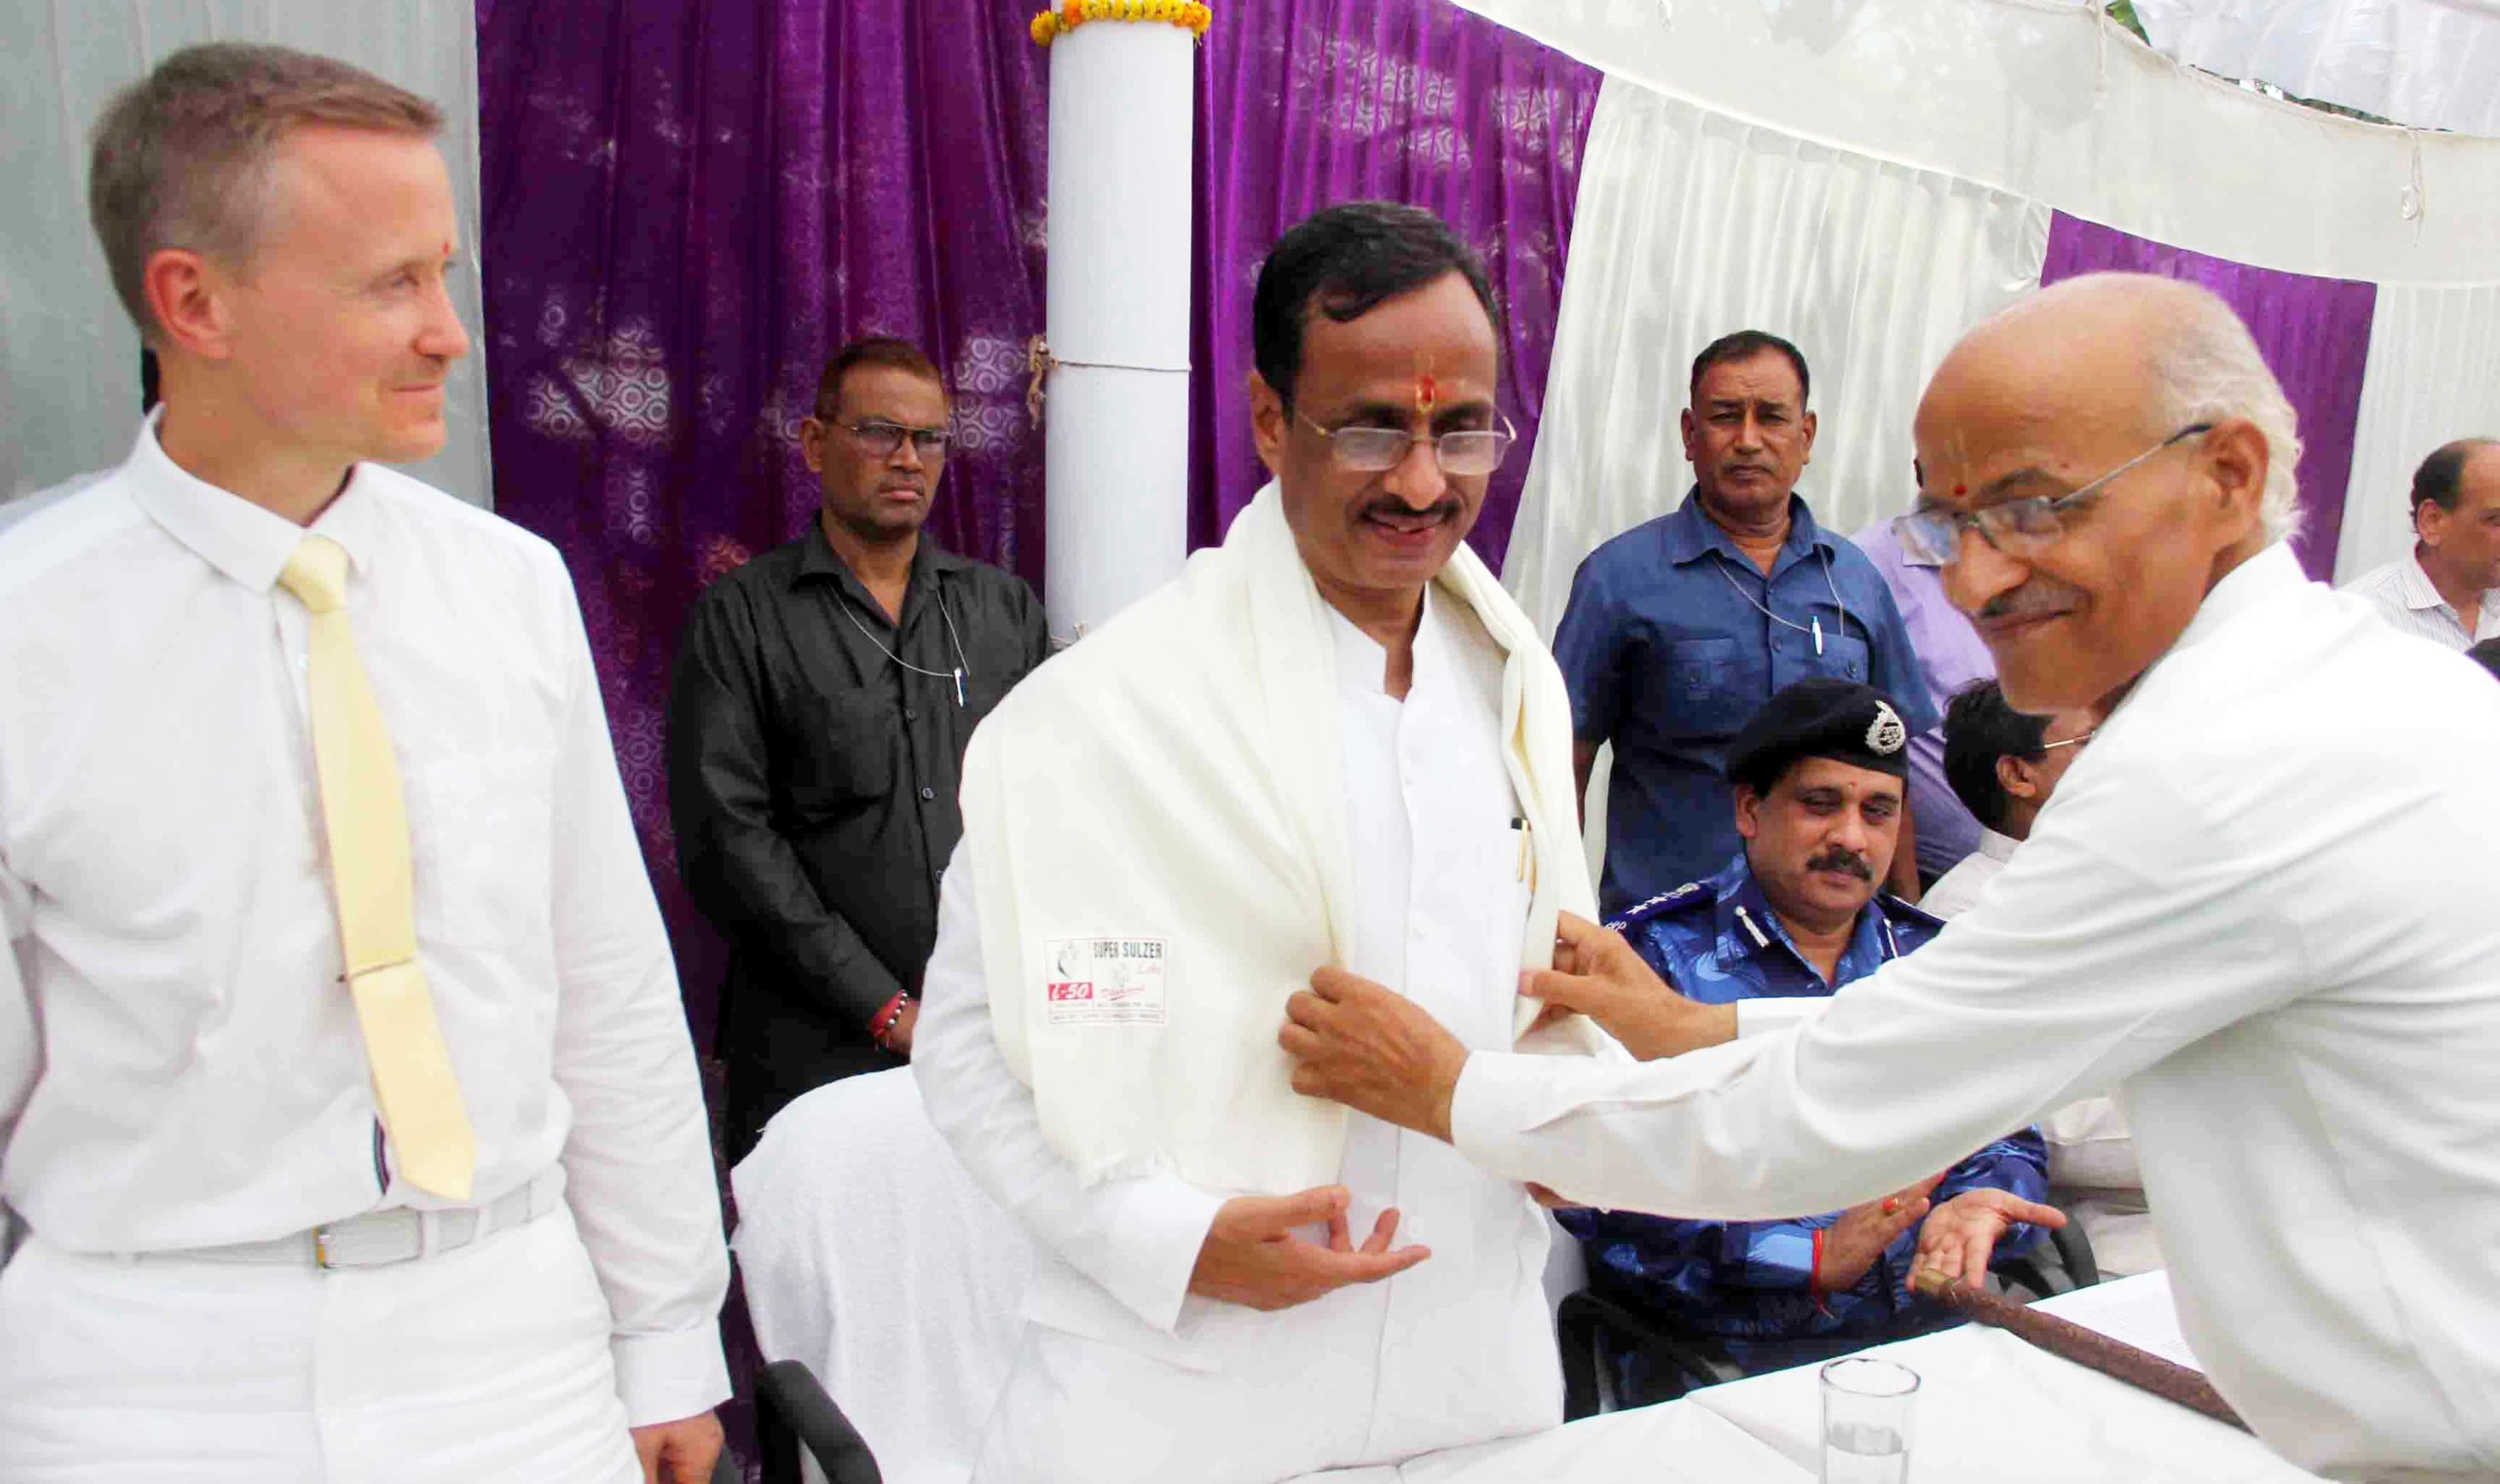 Prof_Sheo_Sagar_Ojha_welcomes_Prof_Dinesh_Sharma_Deputy_C_M_UP_in_Shiv_Ganga_Vidya_Mandir_Allahabad